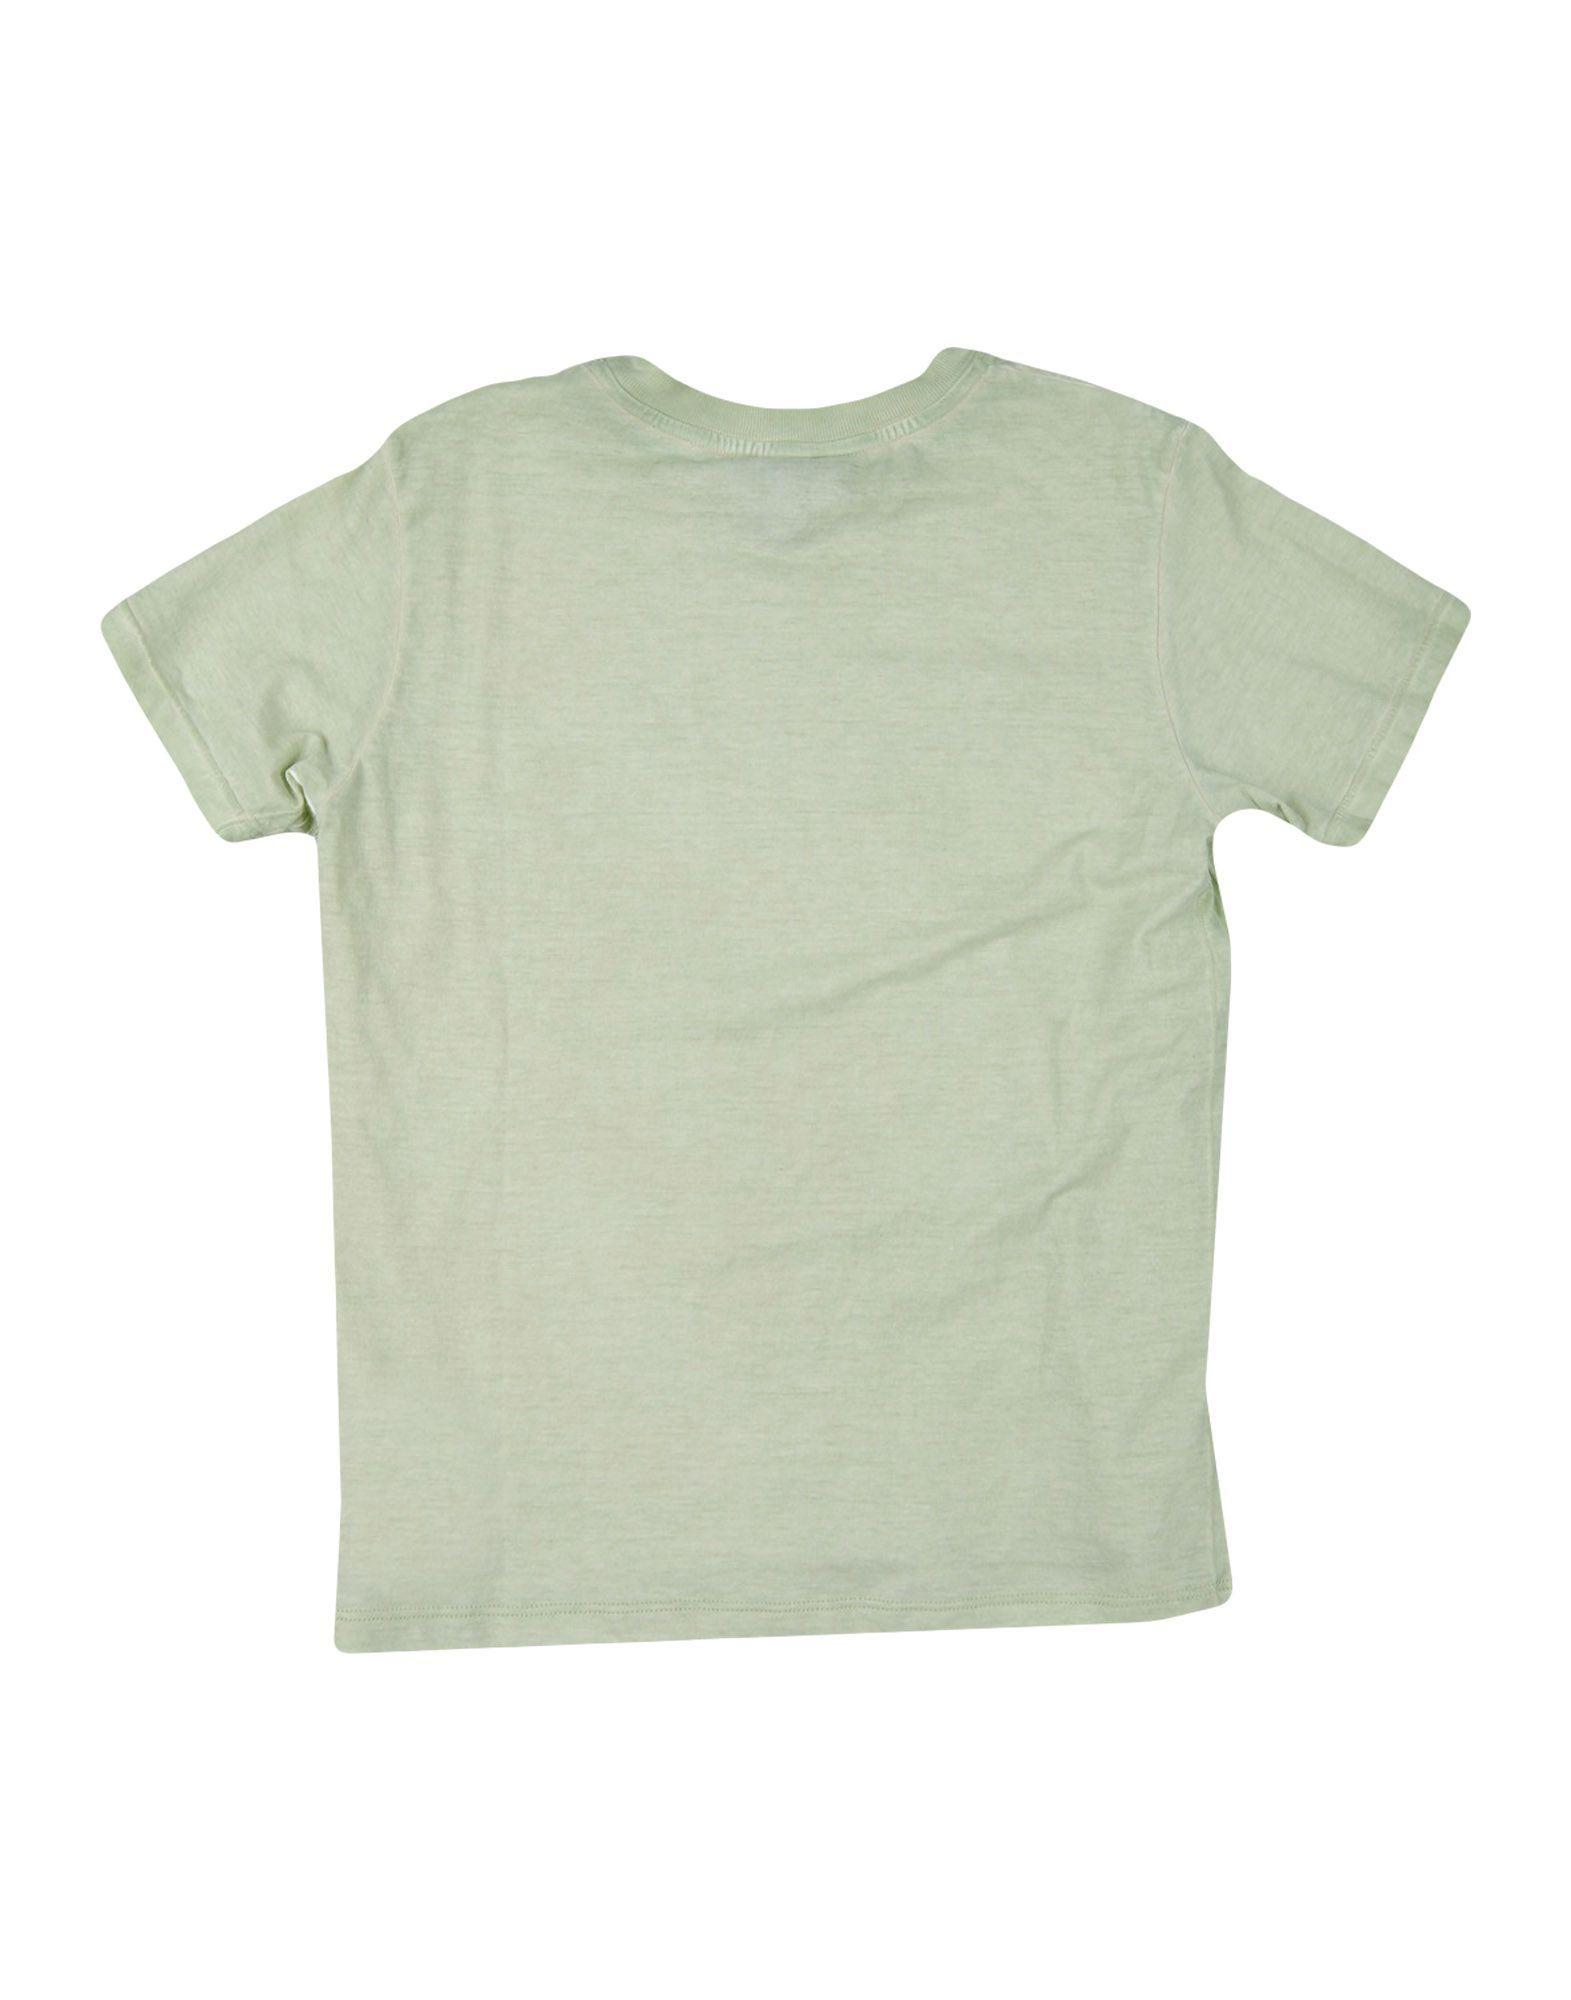 TOPWEAR Armani Junior Light green Girl Cotton